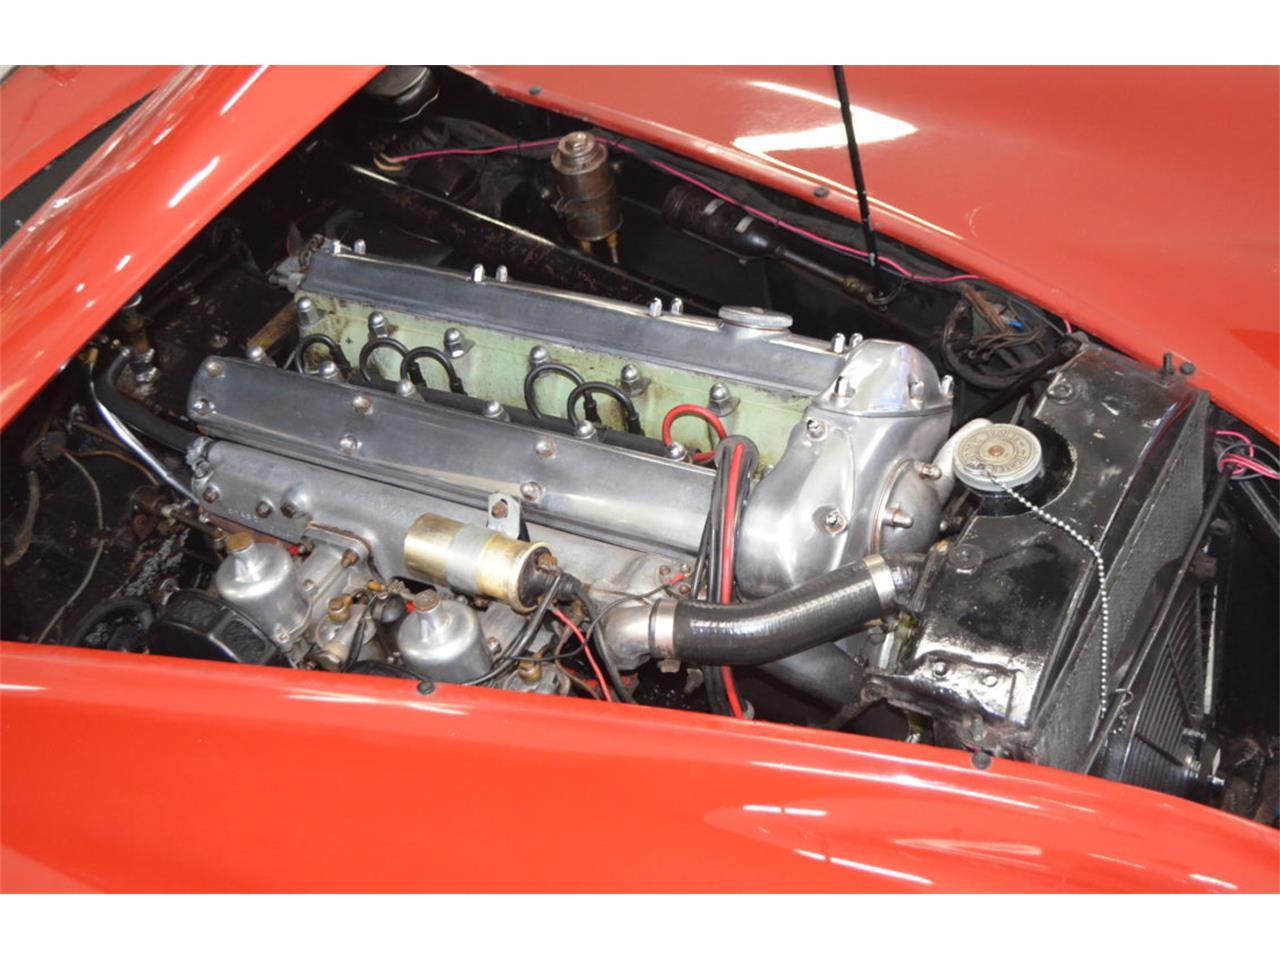 Large Picture of Classic '52 Jaguar XK120 located in Arizona - $69,800.00 Offered by Classic Promenade - PXTA